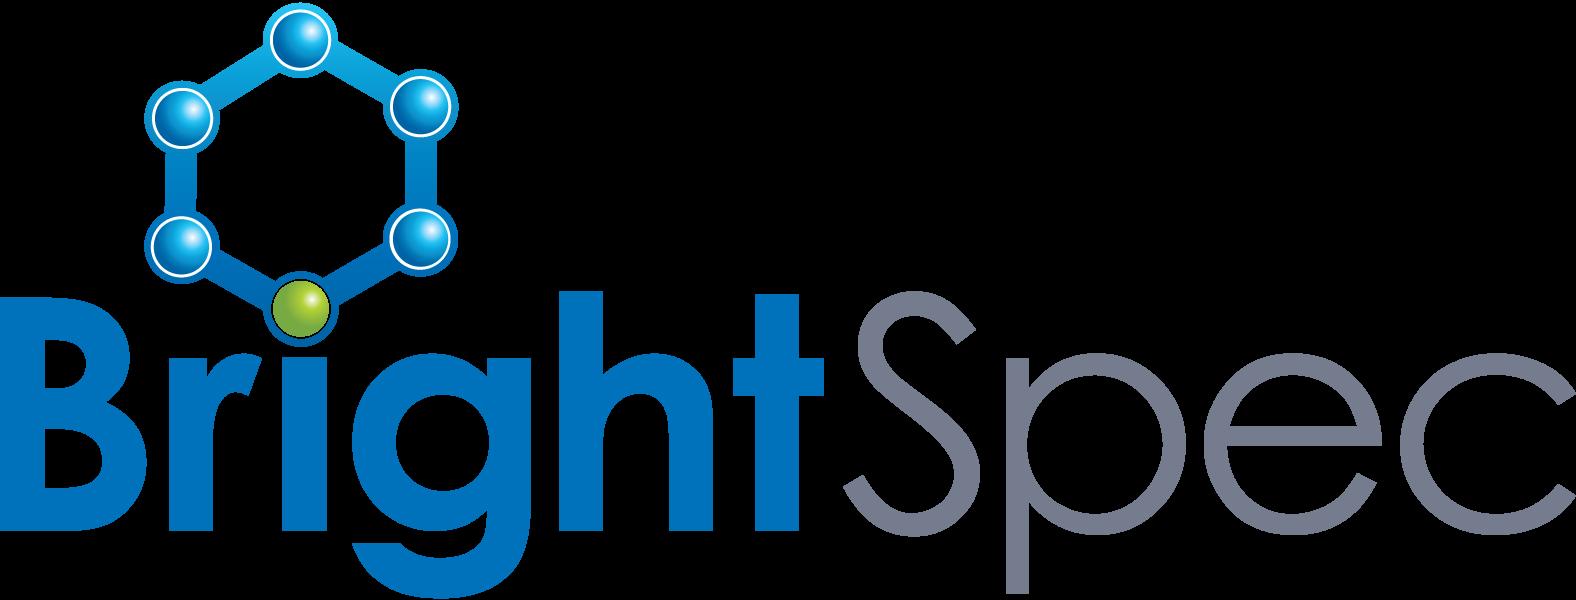 BrightSpec